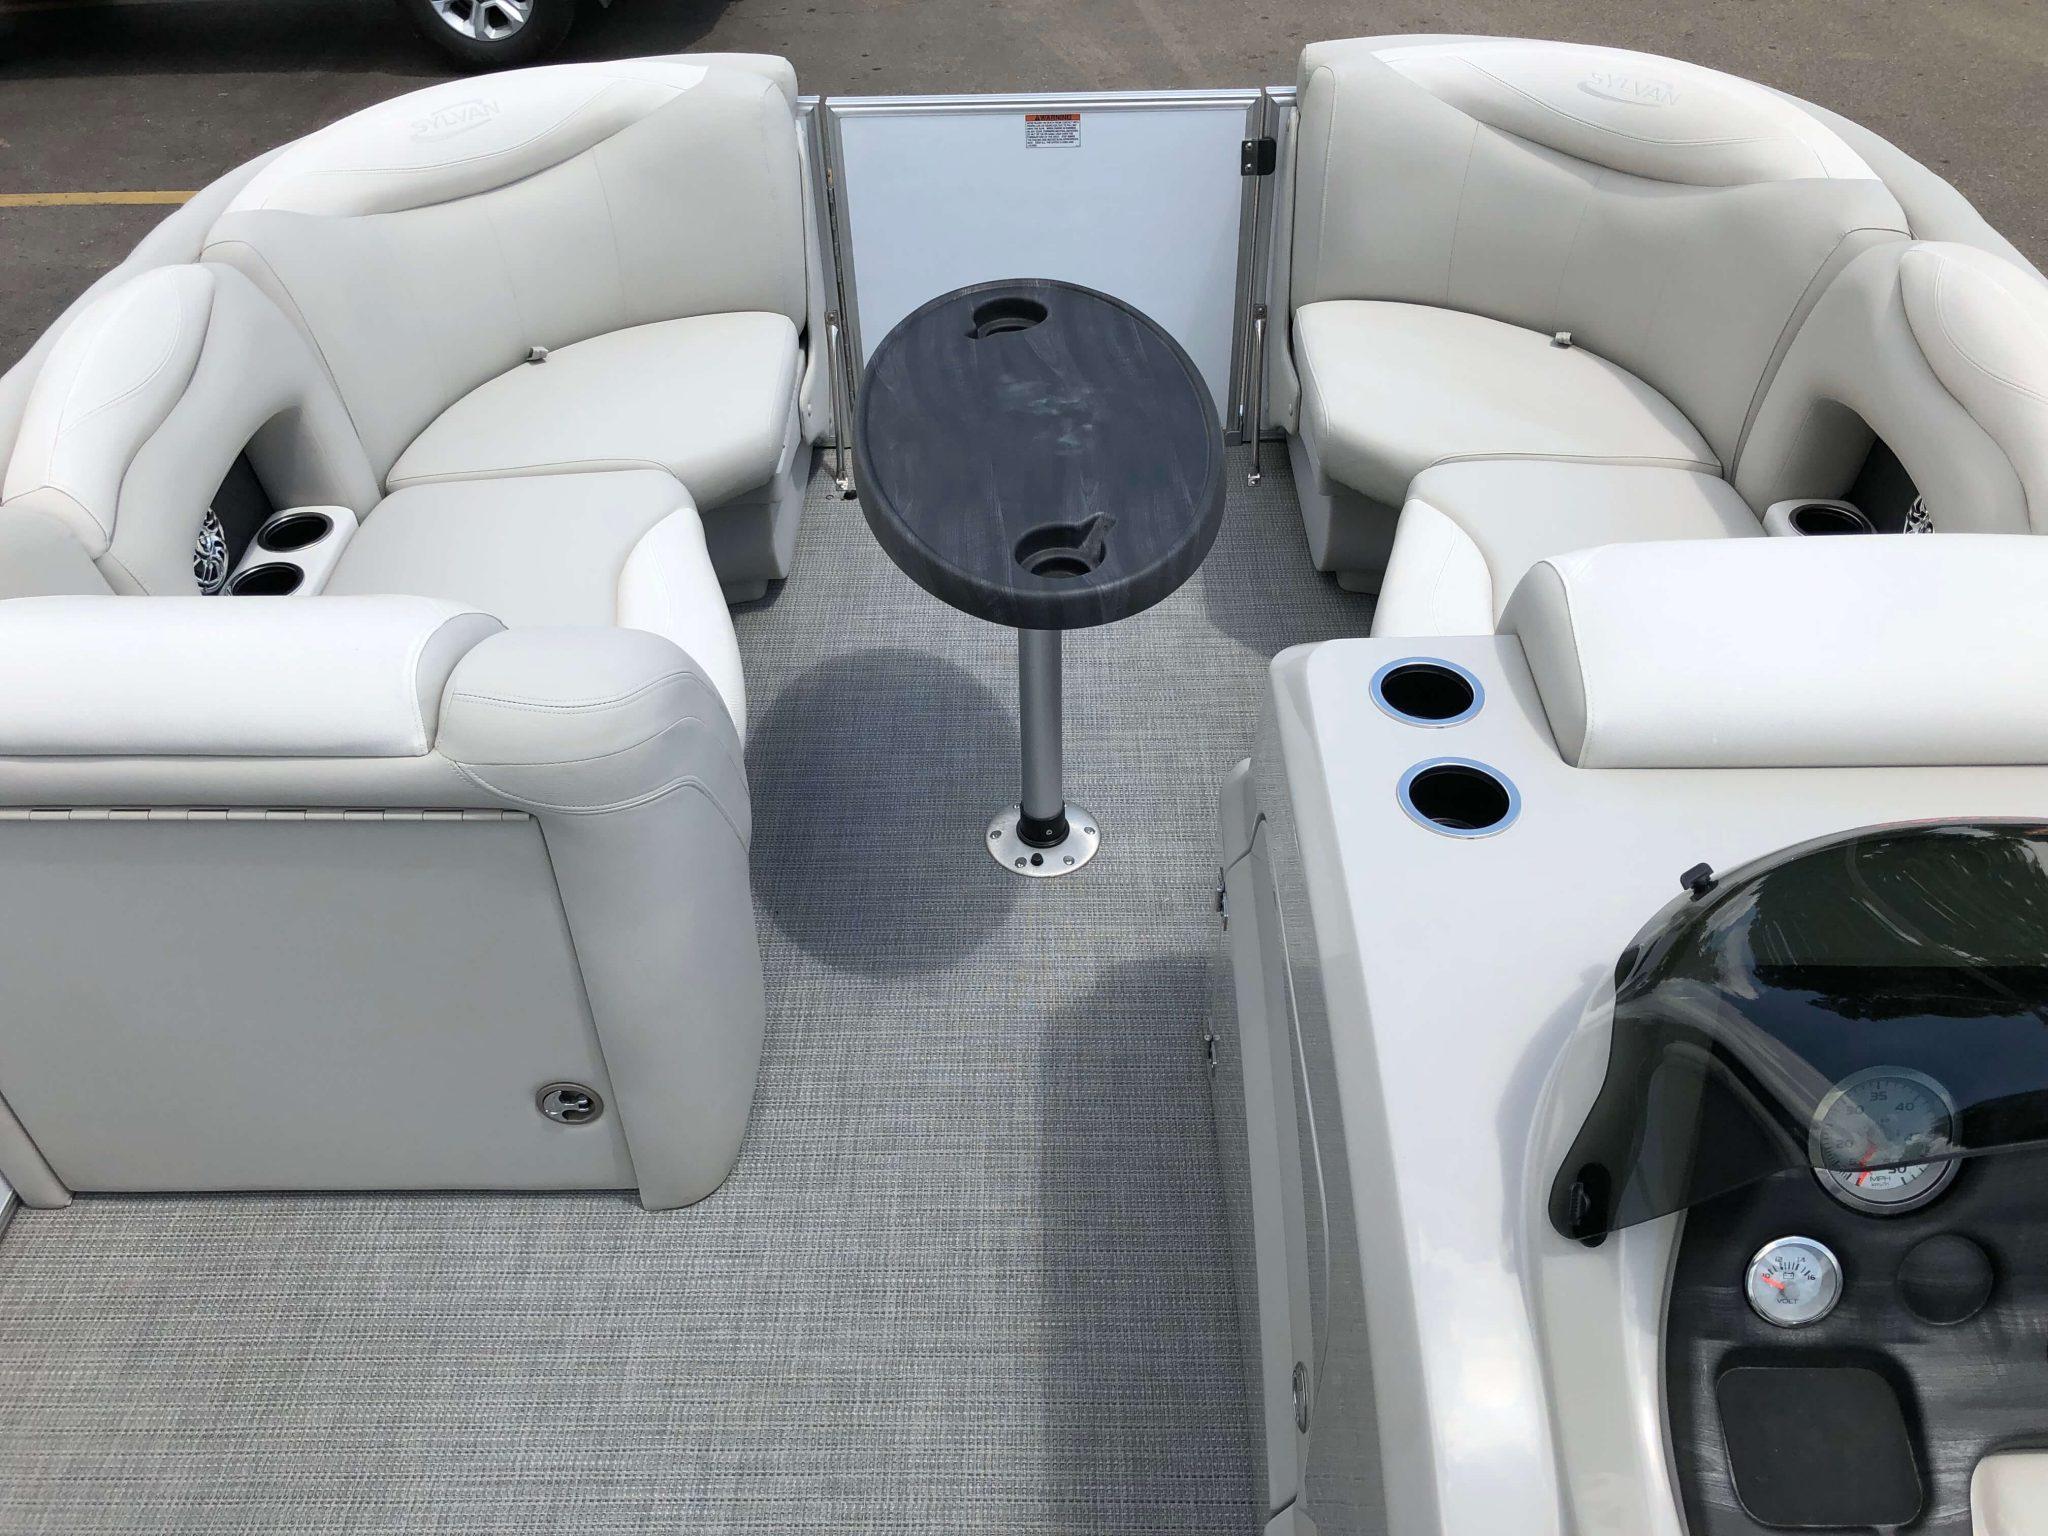 2016 Sylvan 8520 LZ LES Pontoon Boat Layout 6